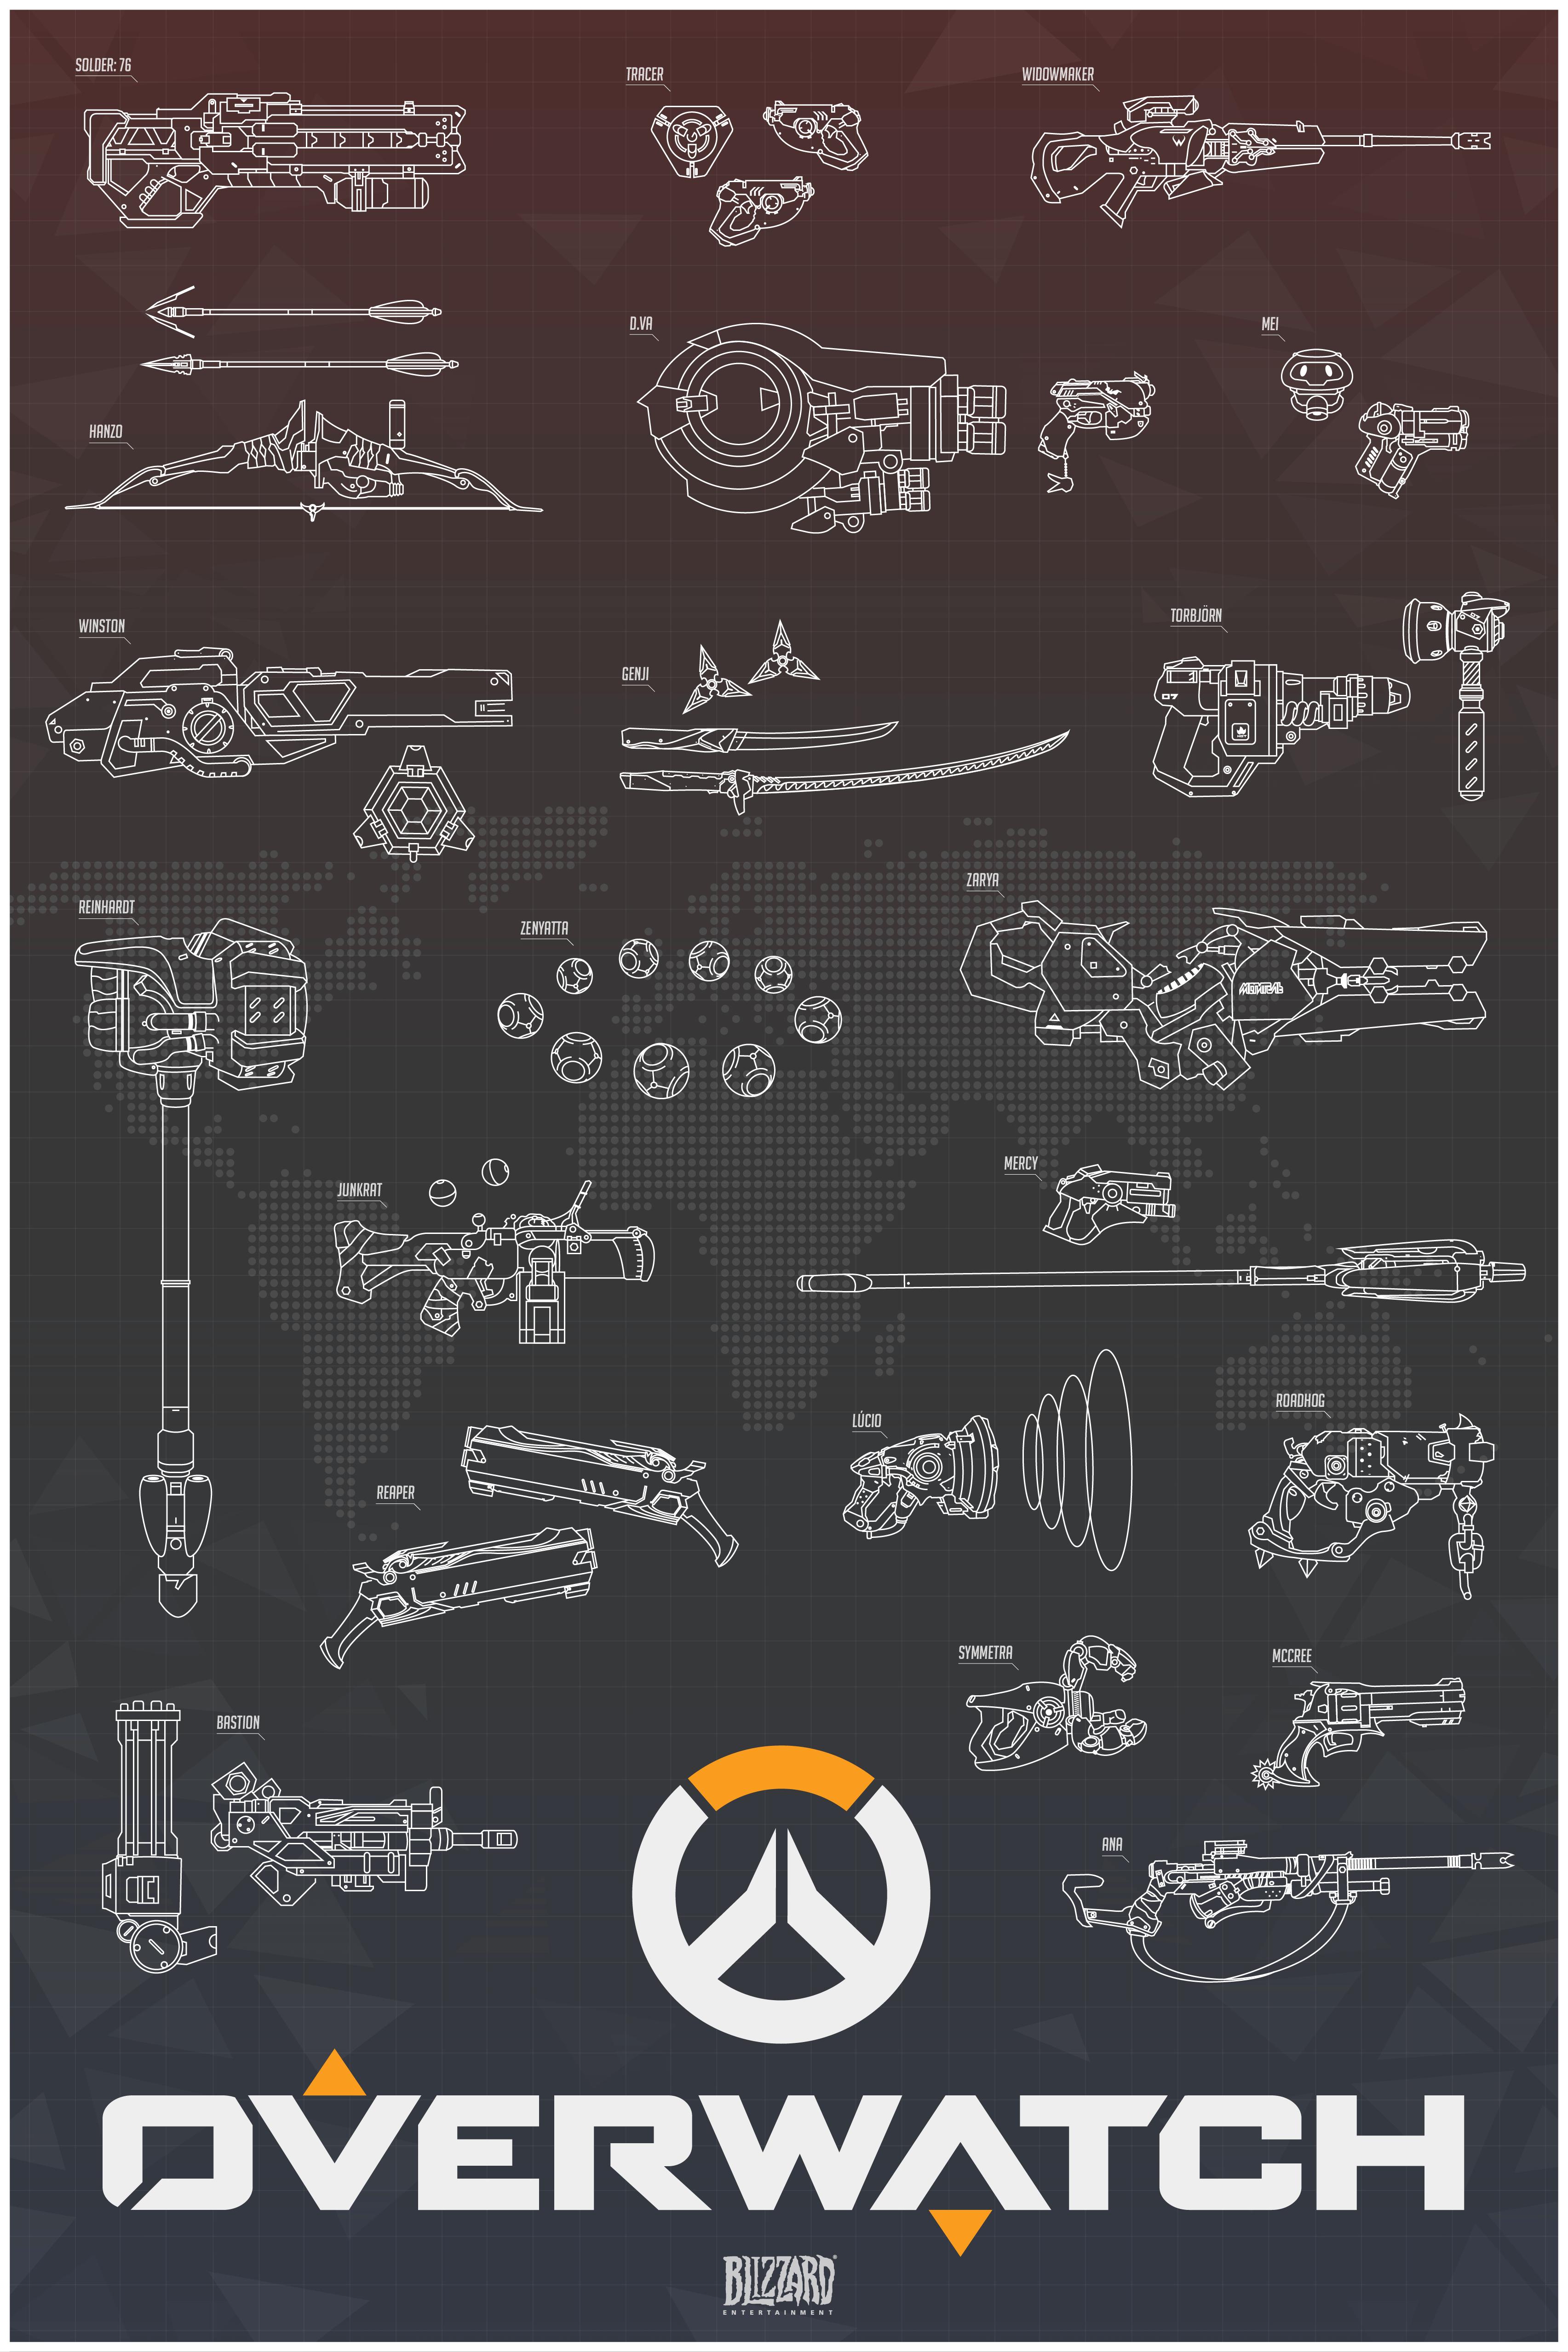 Overwatch_large-01